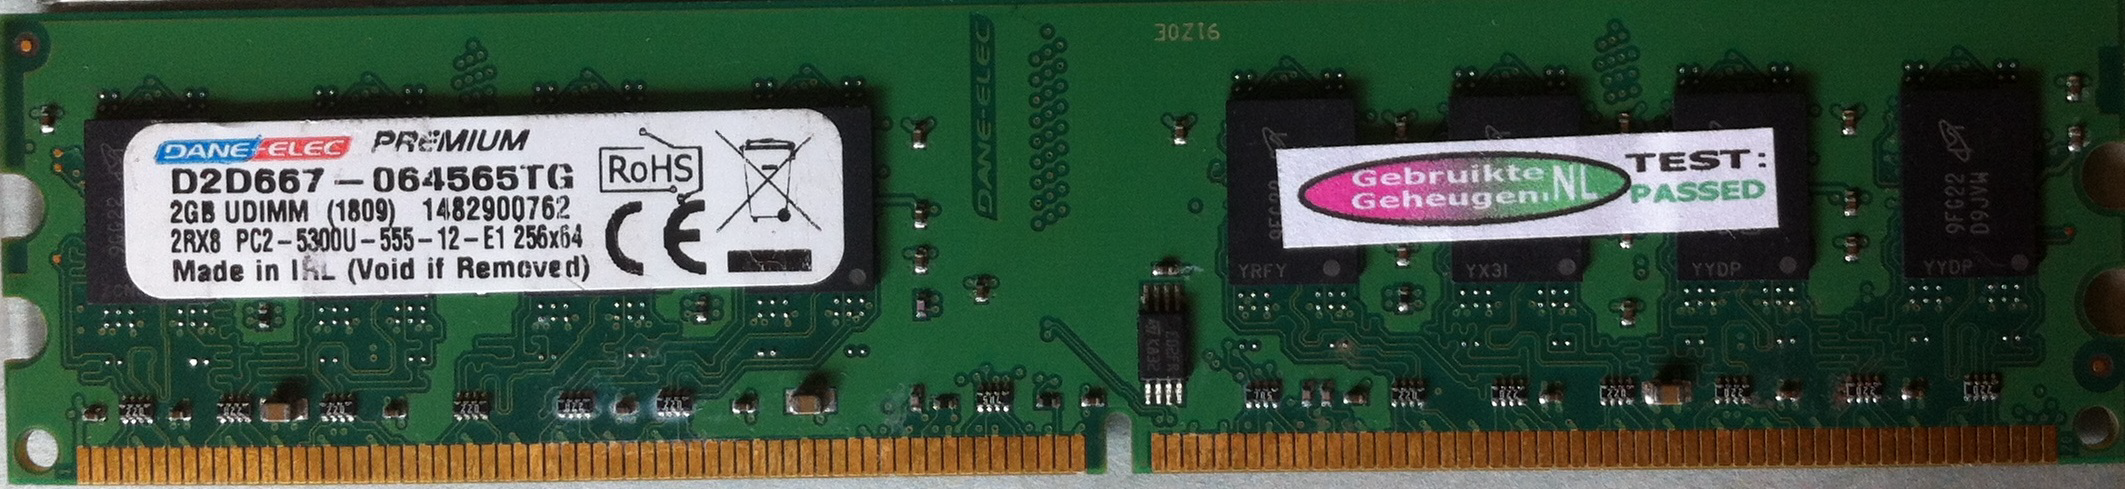 DaneElec 2GB DDR2 PC2-5300U 667MHz